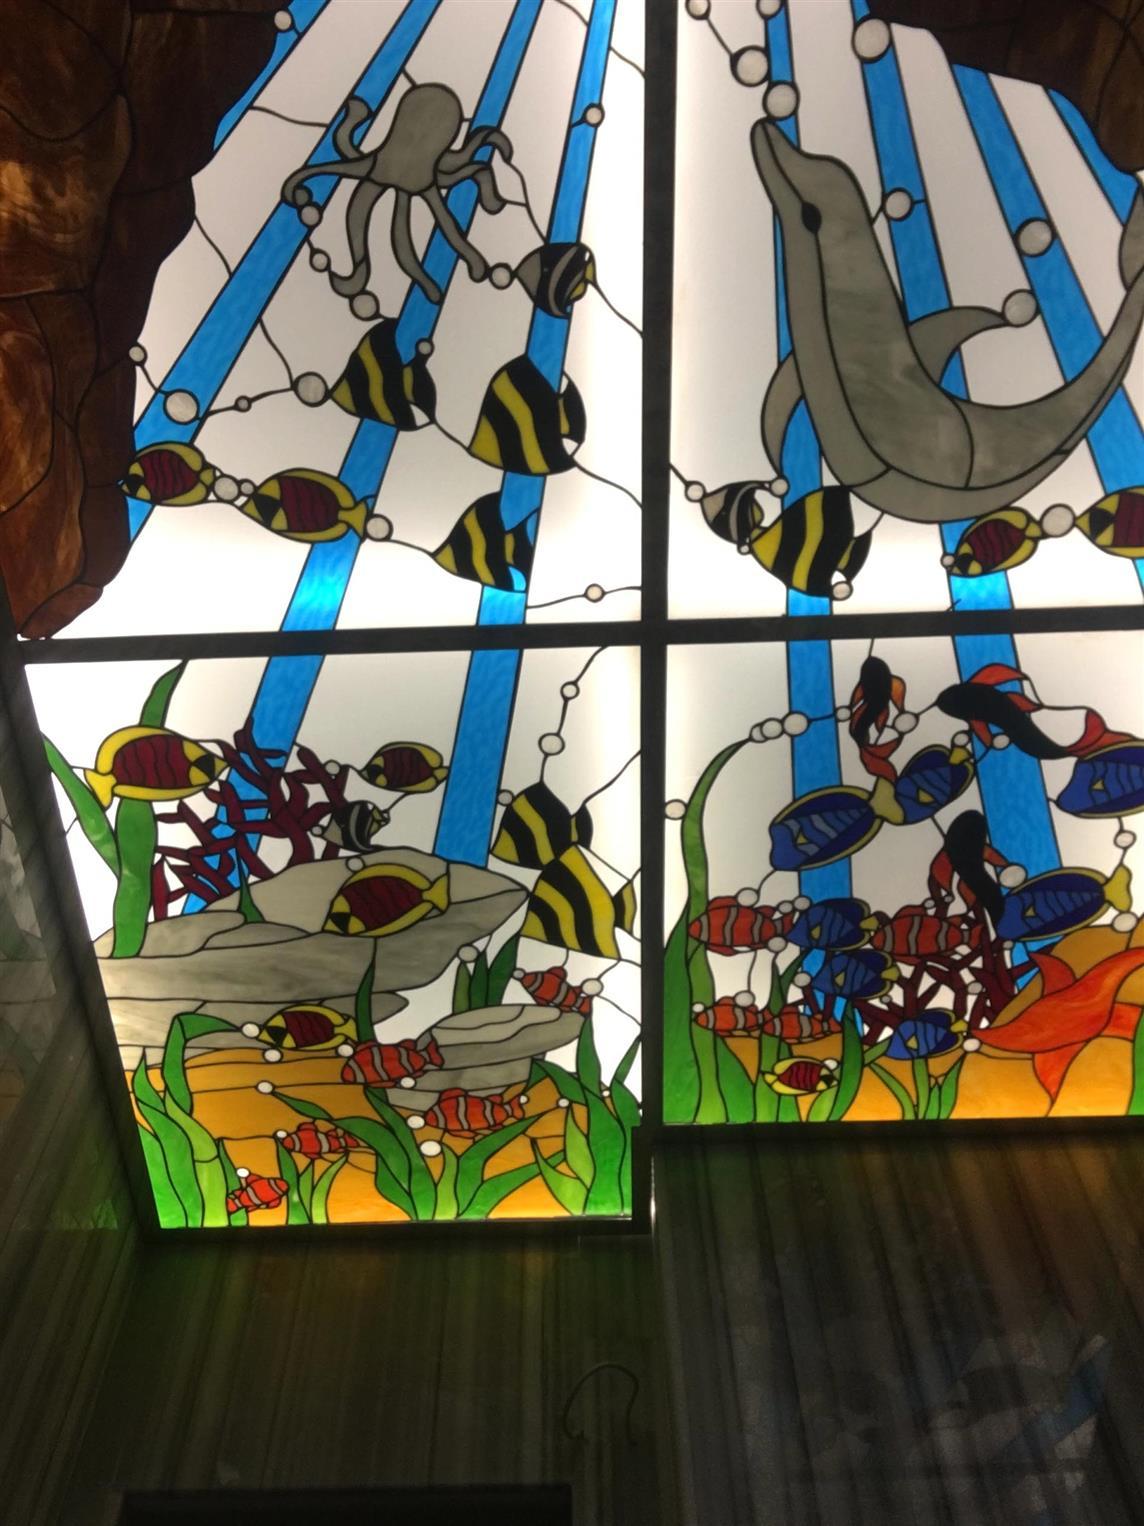 hamam-banyo-tavan-vitraylari20171221185149964.jpg izmir vitray çalışması